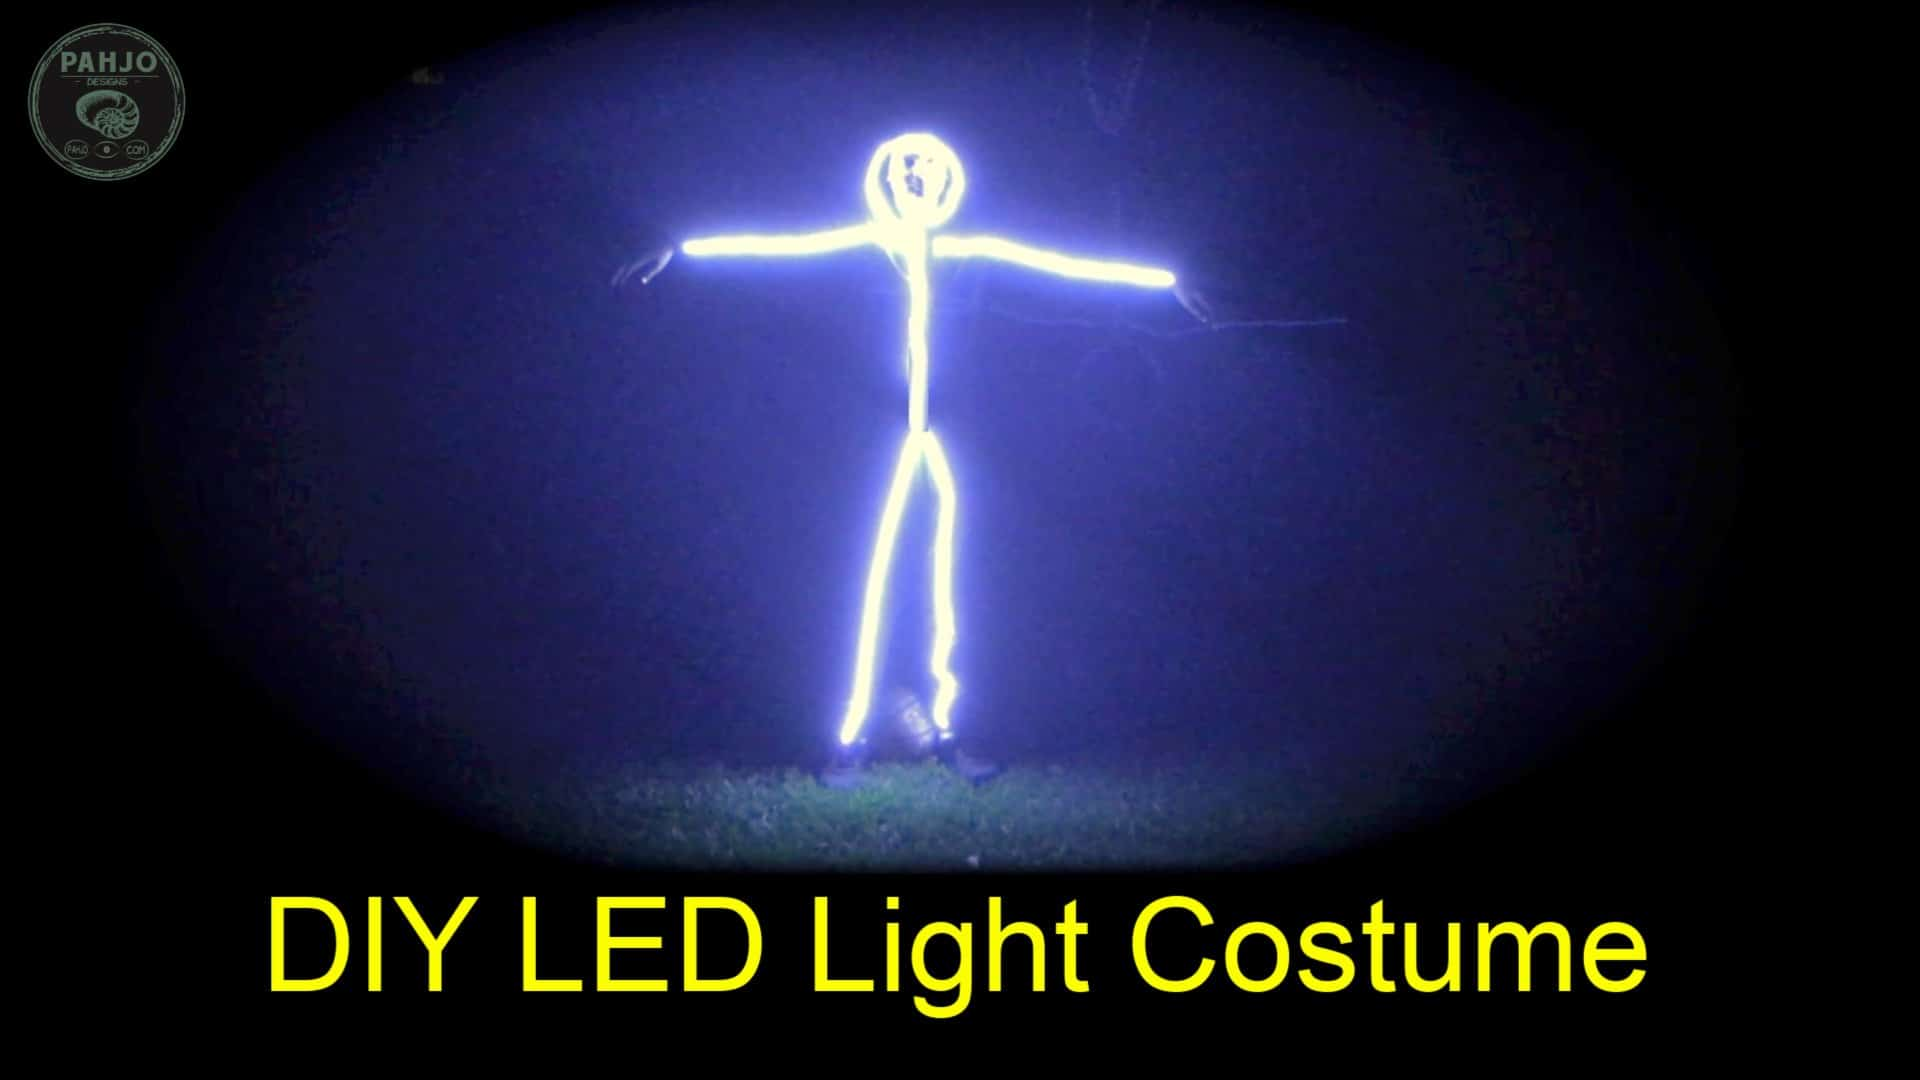 DIY LED Light Costume